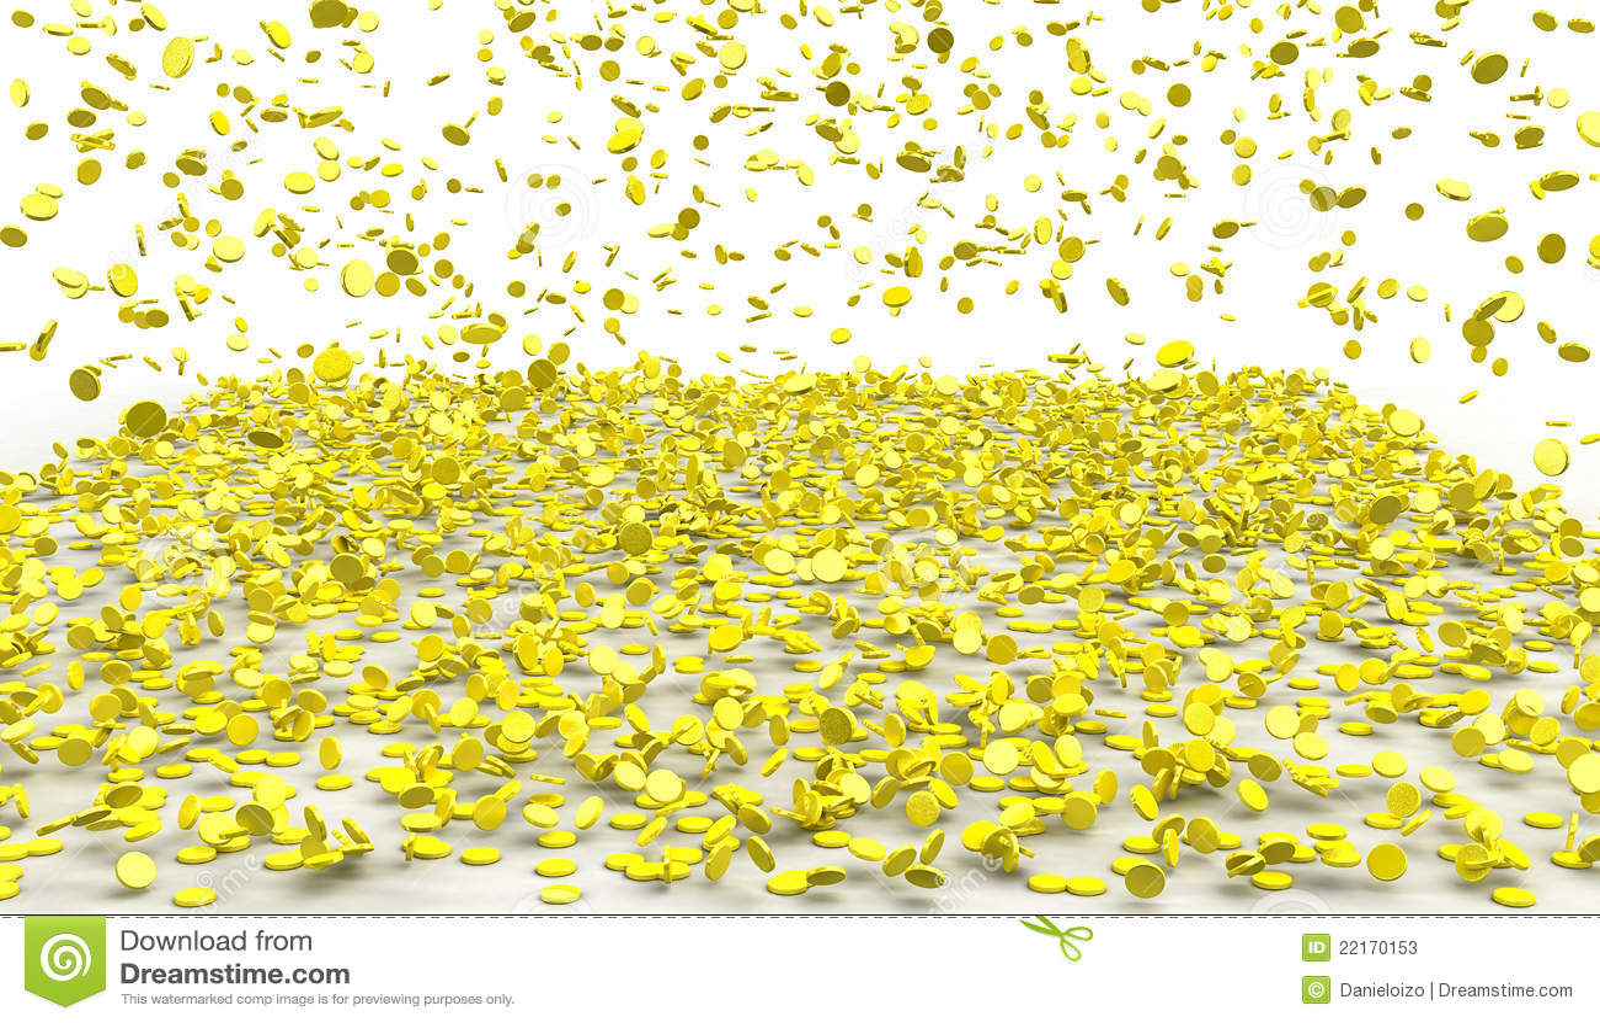 raining gold stock photos image 22170153